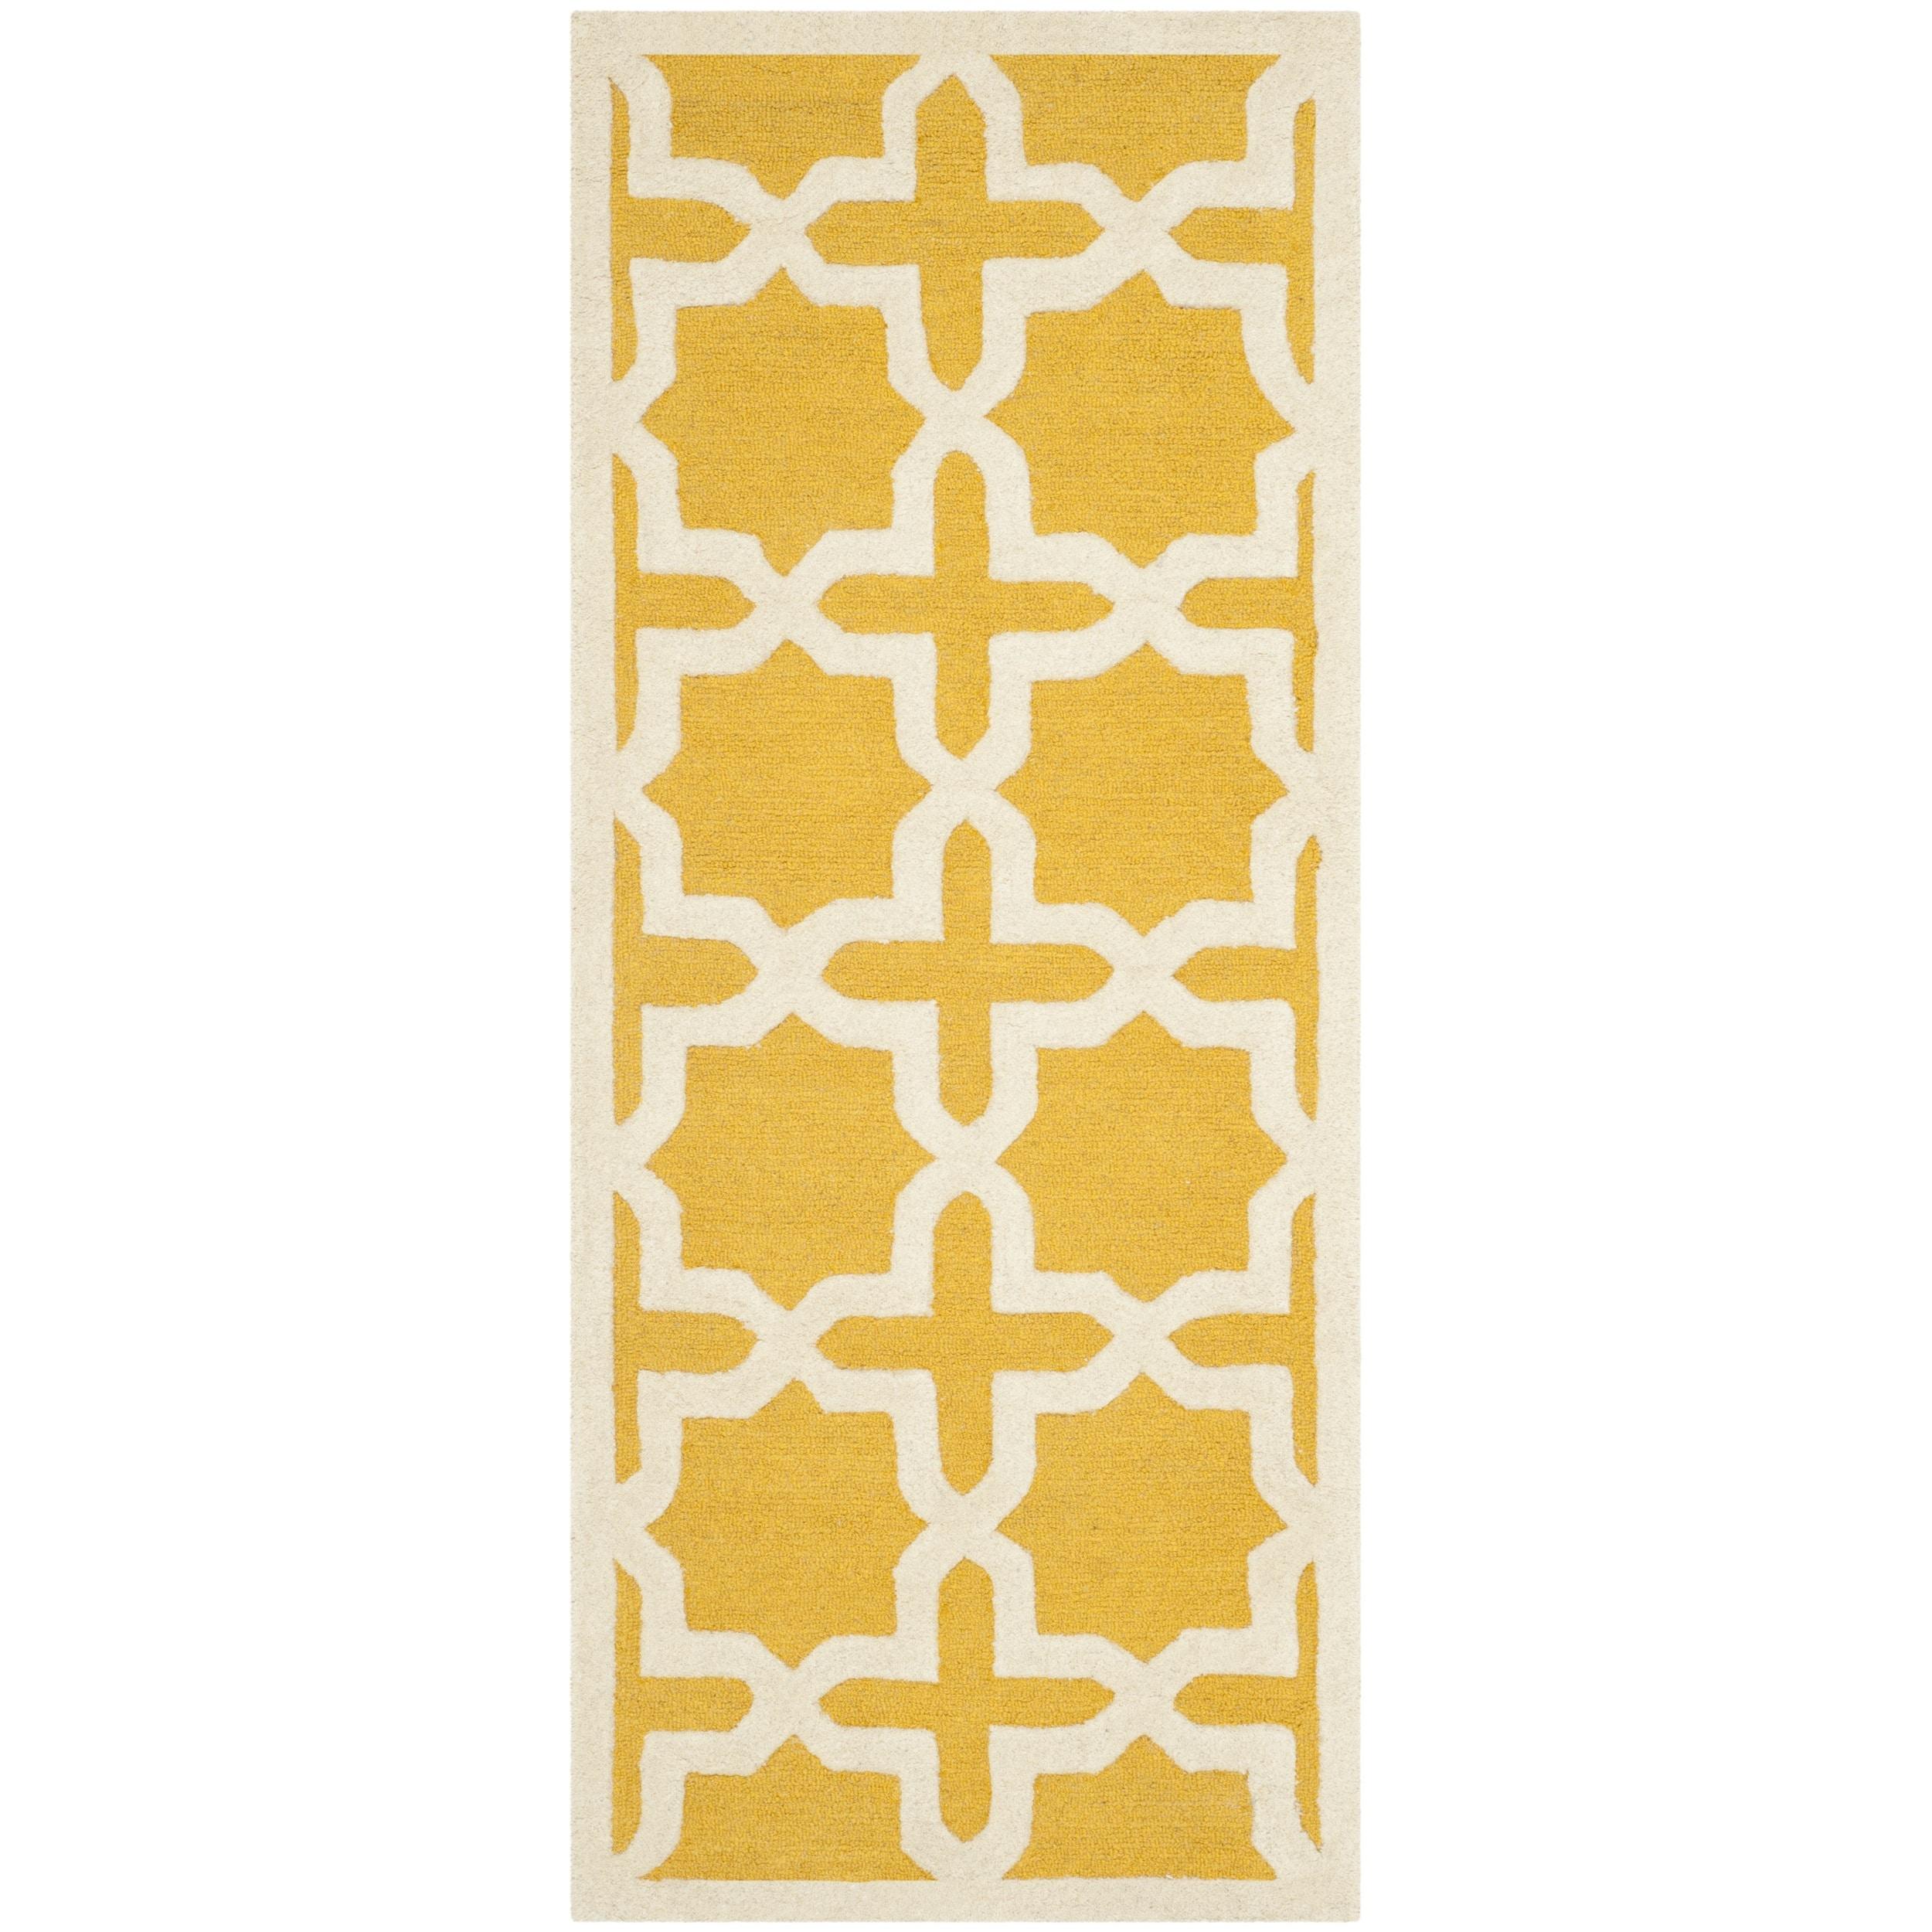 Safavieh Handmade Moroccan Cambridge Trellis Pattern Gold